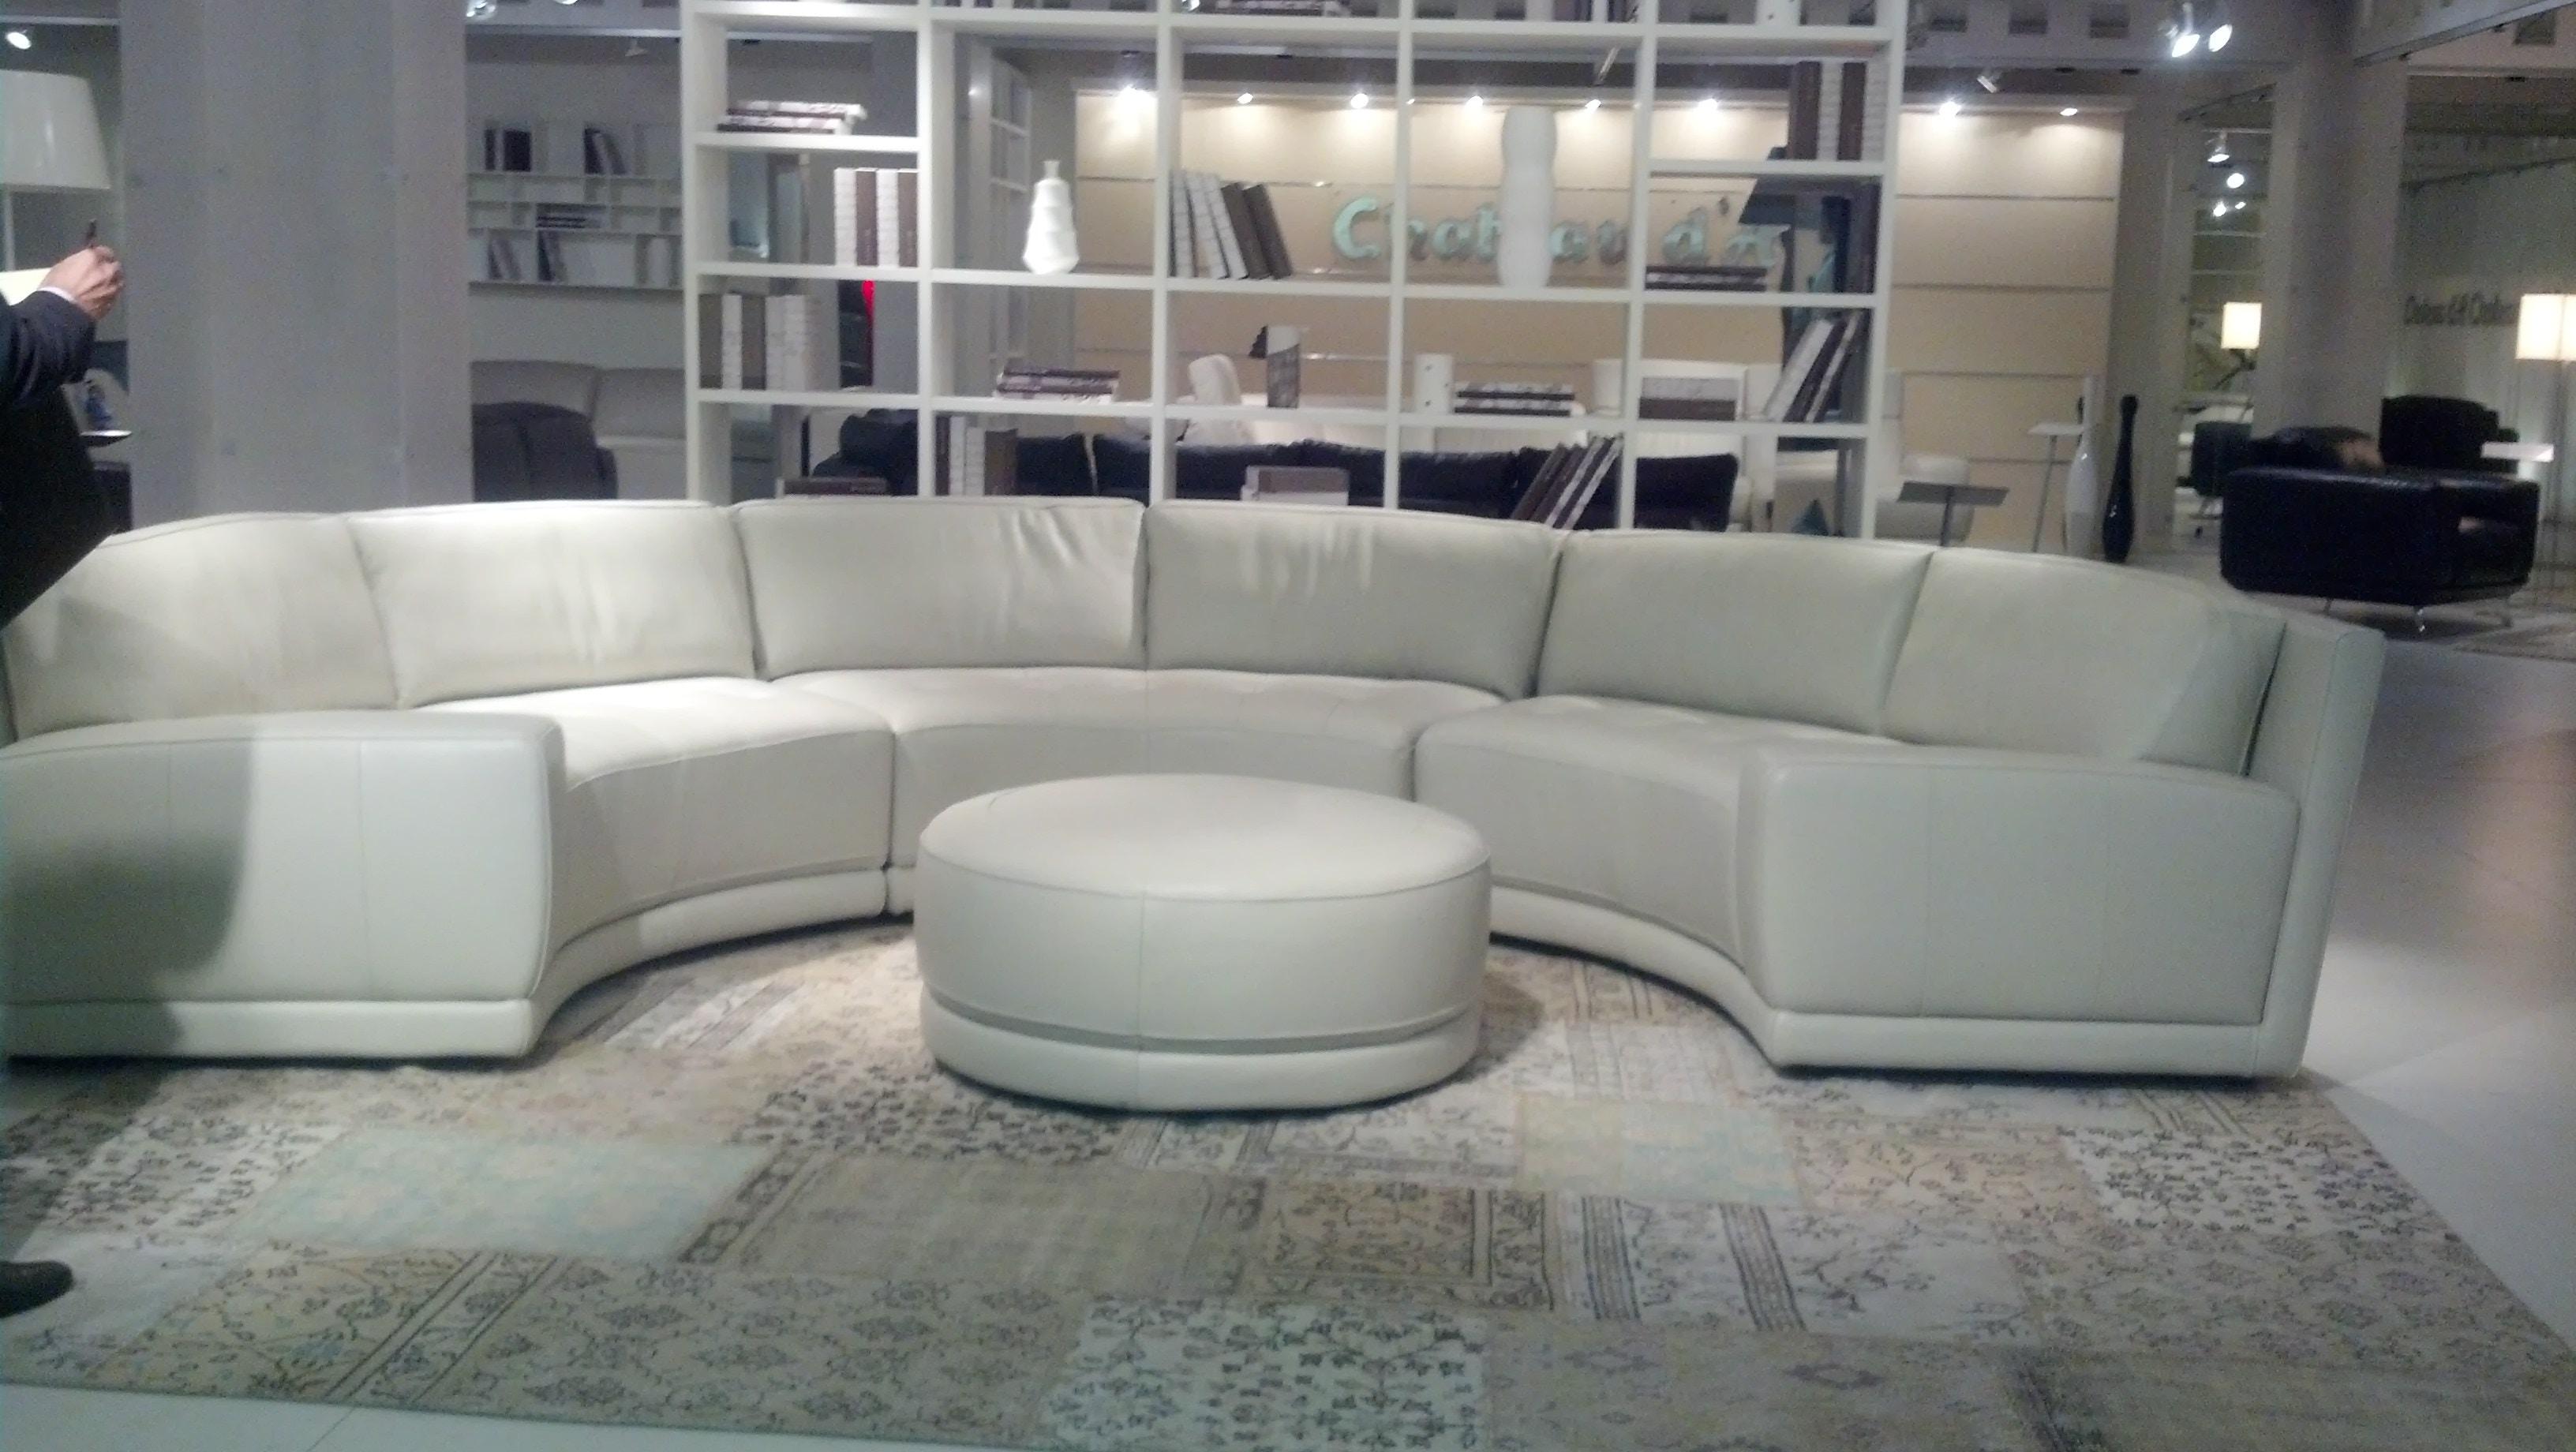 Chateau Du0027ax Living Room Sleek Curved Italian Leather Sectional. U807 At Hamilton  Sofa U0026 Leather Gallery